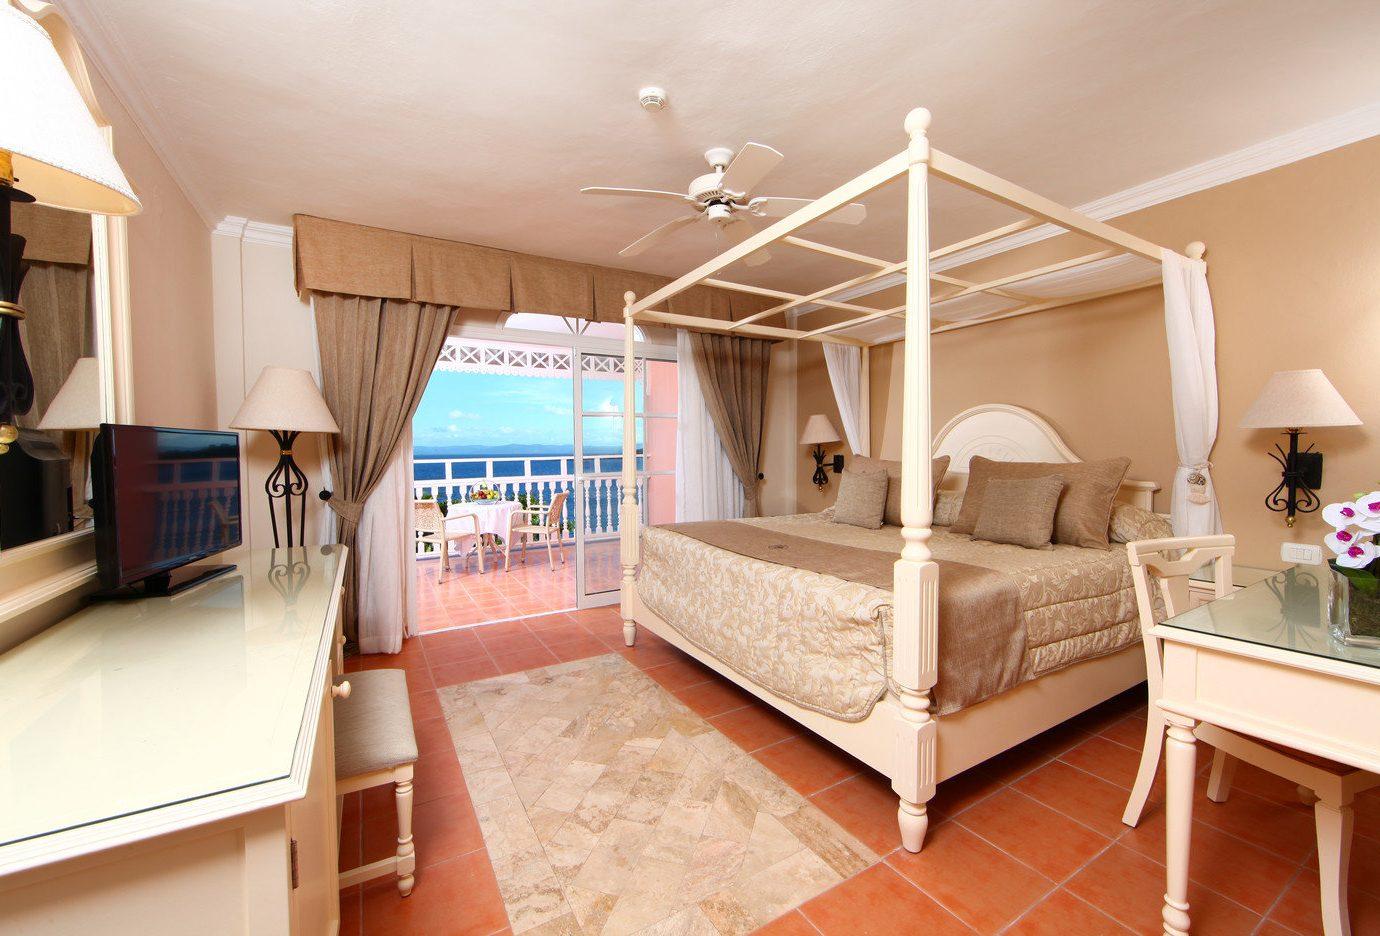 All-Inclusive Resorts Budget caribbean Hotels floor indoor wall room ceiling real estate Bedroom interior design estate Suite furniture